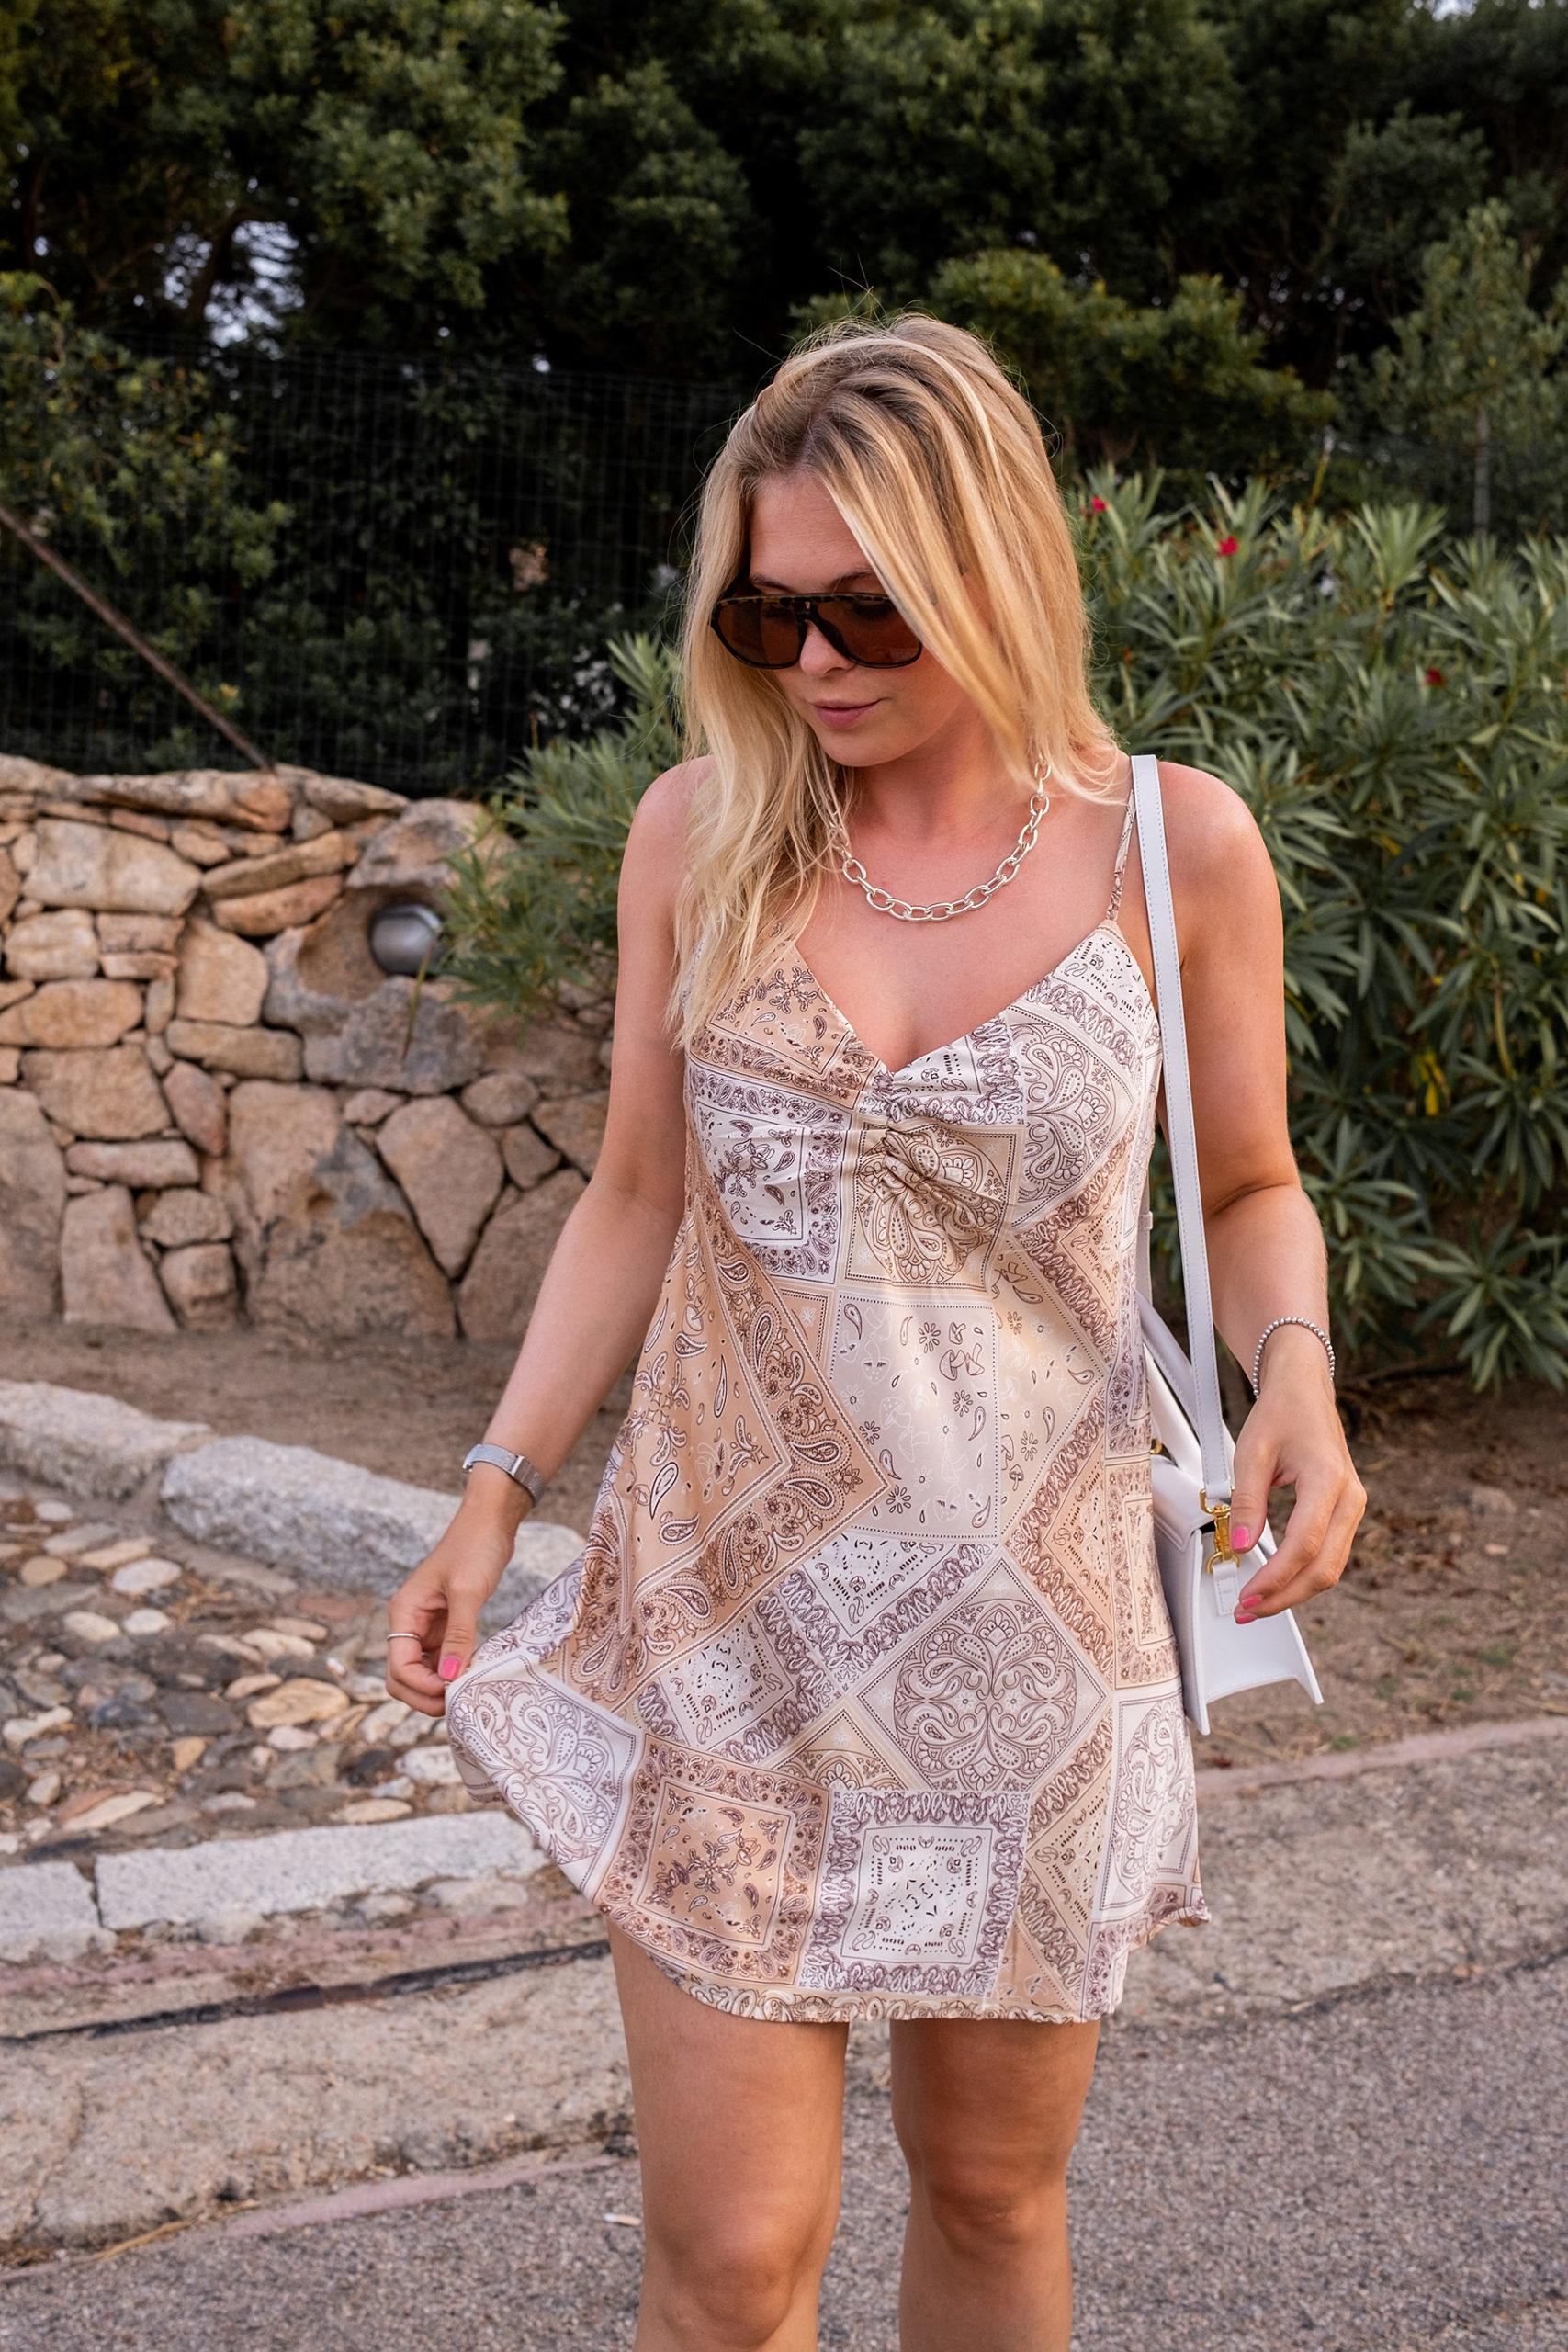 slipkleid outfit urlaub fashion blogger inga brauer